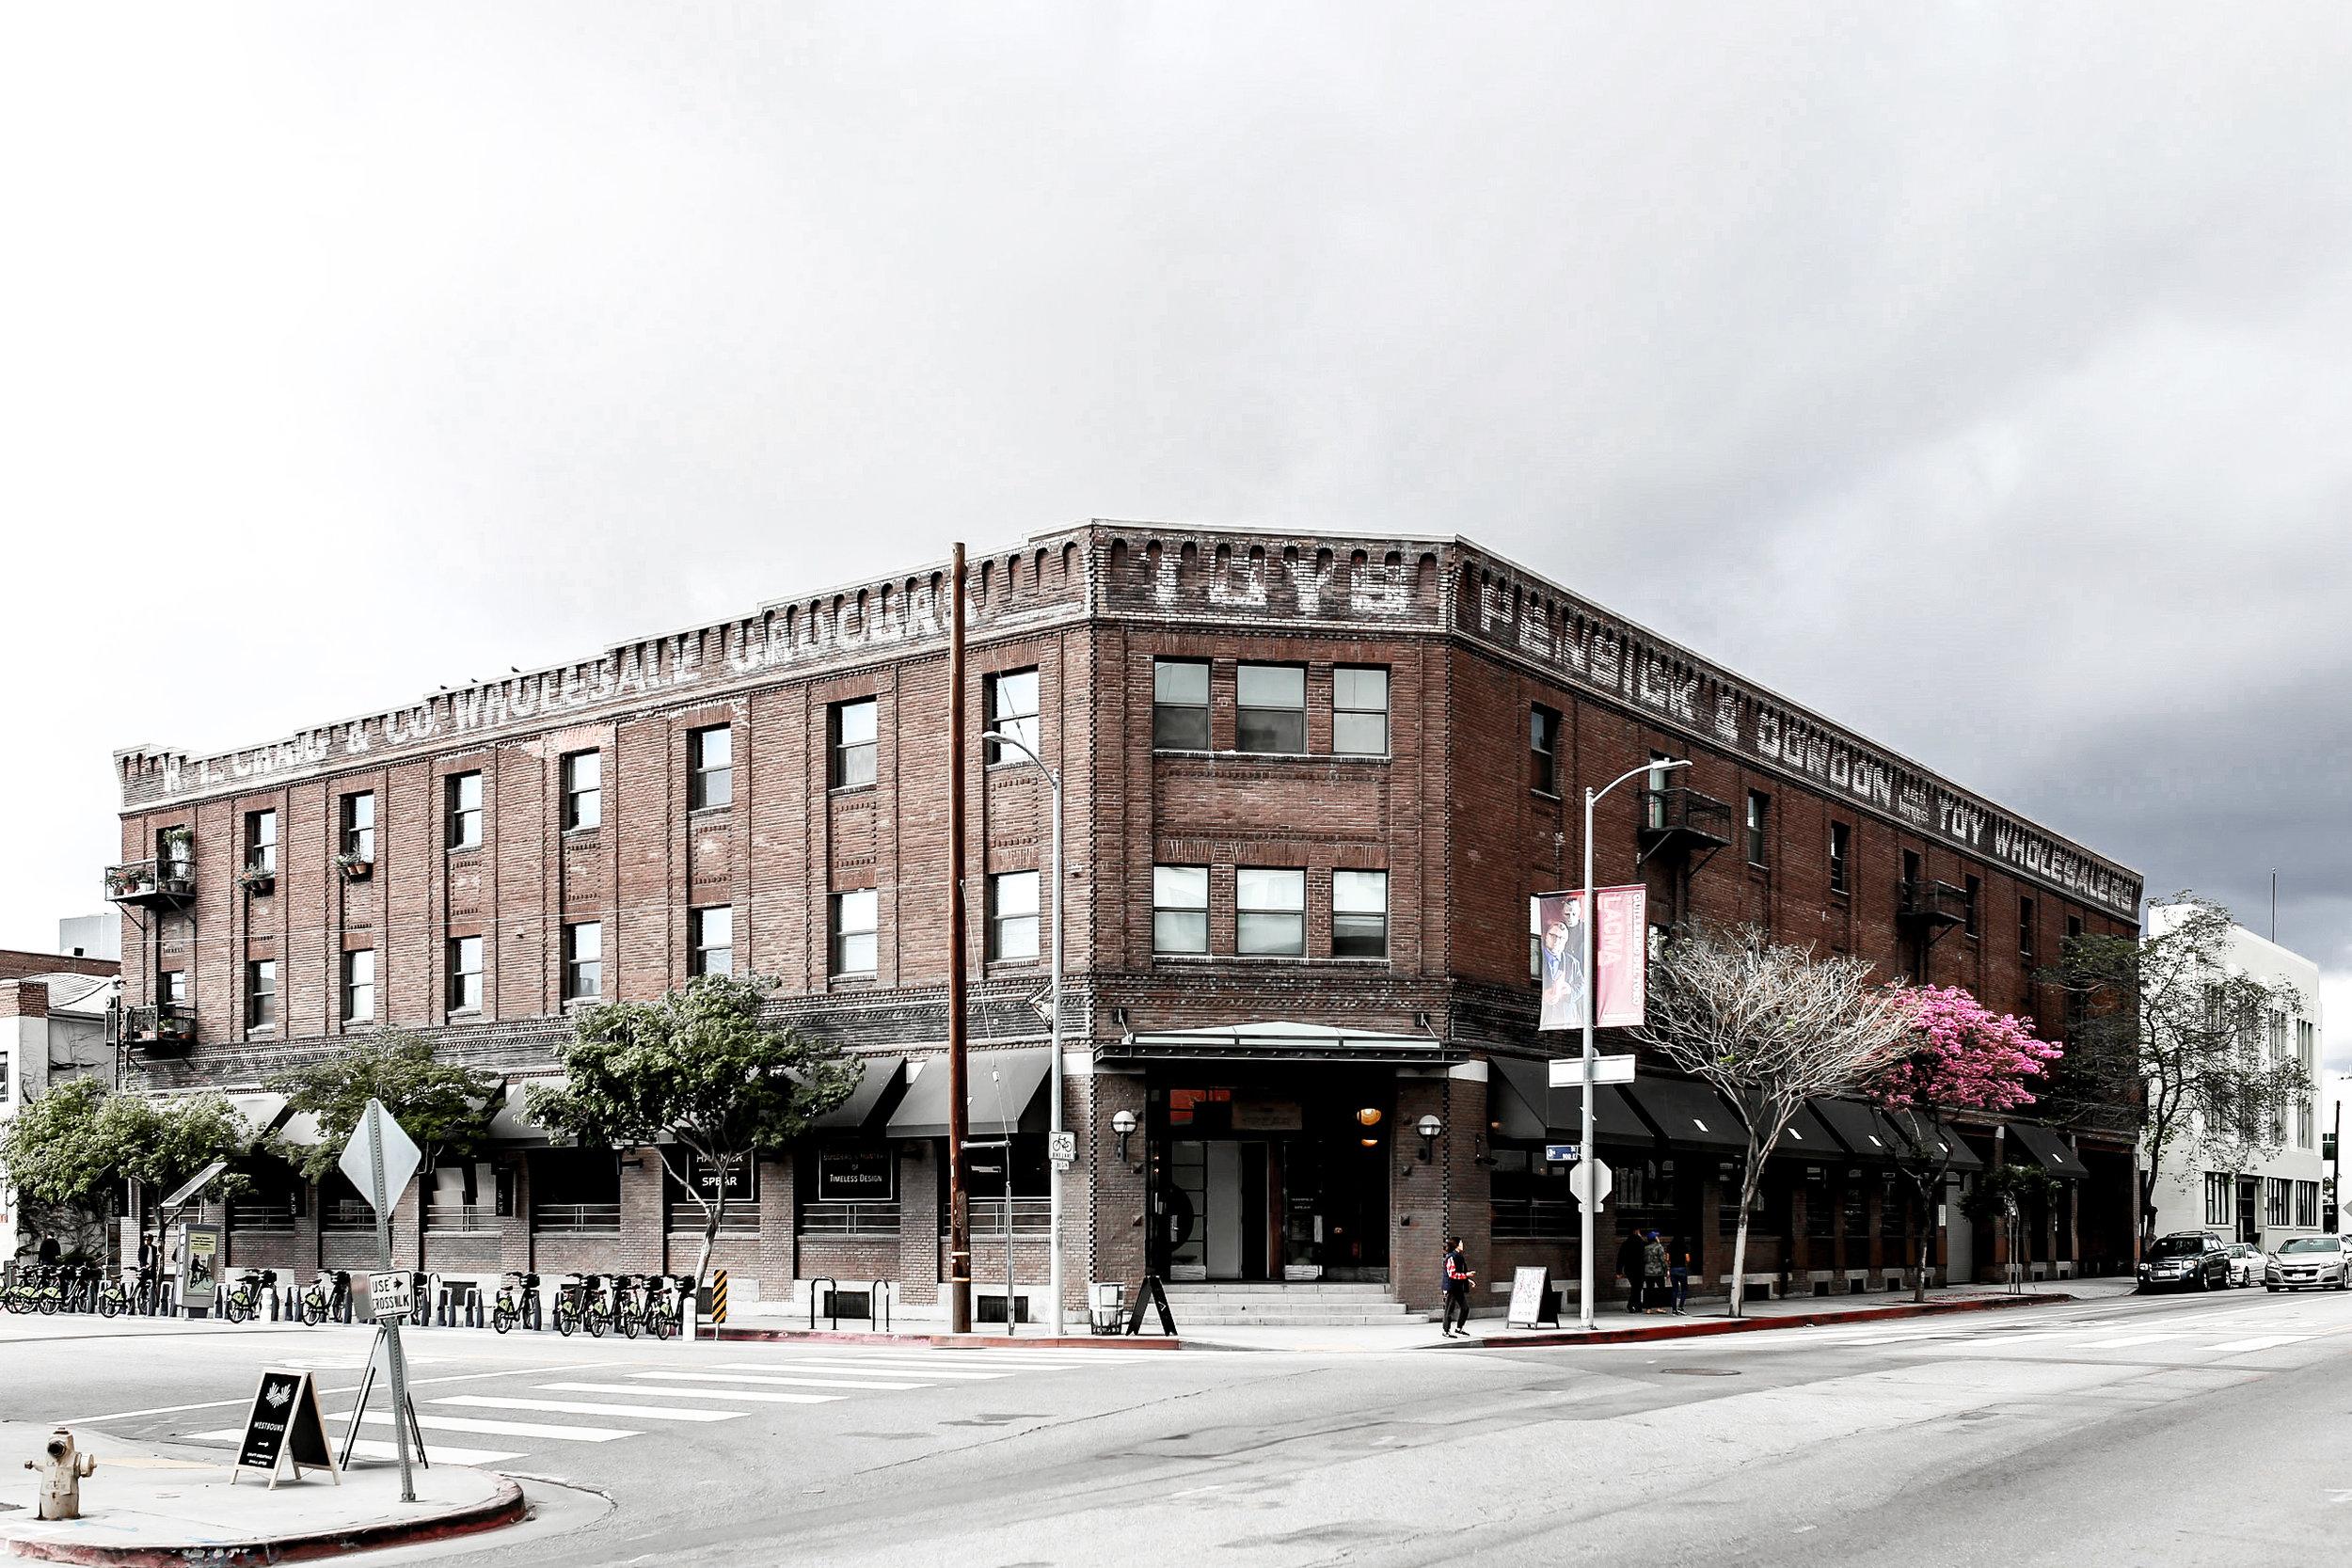 Art District Los Angeles, 2016